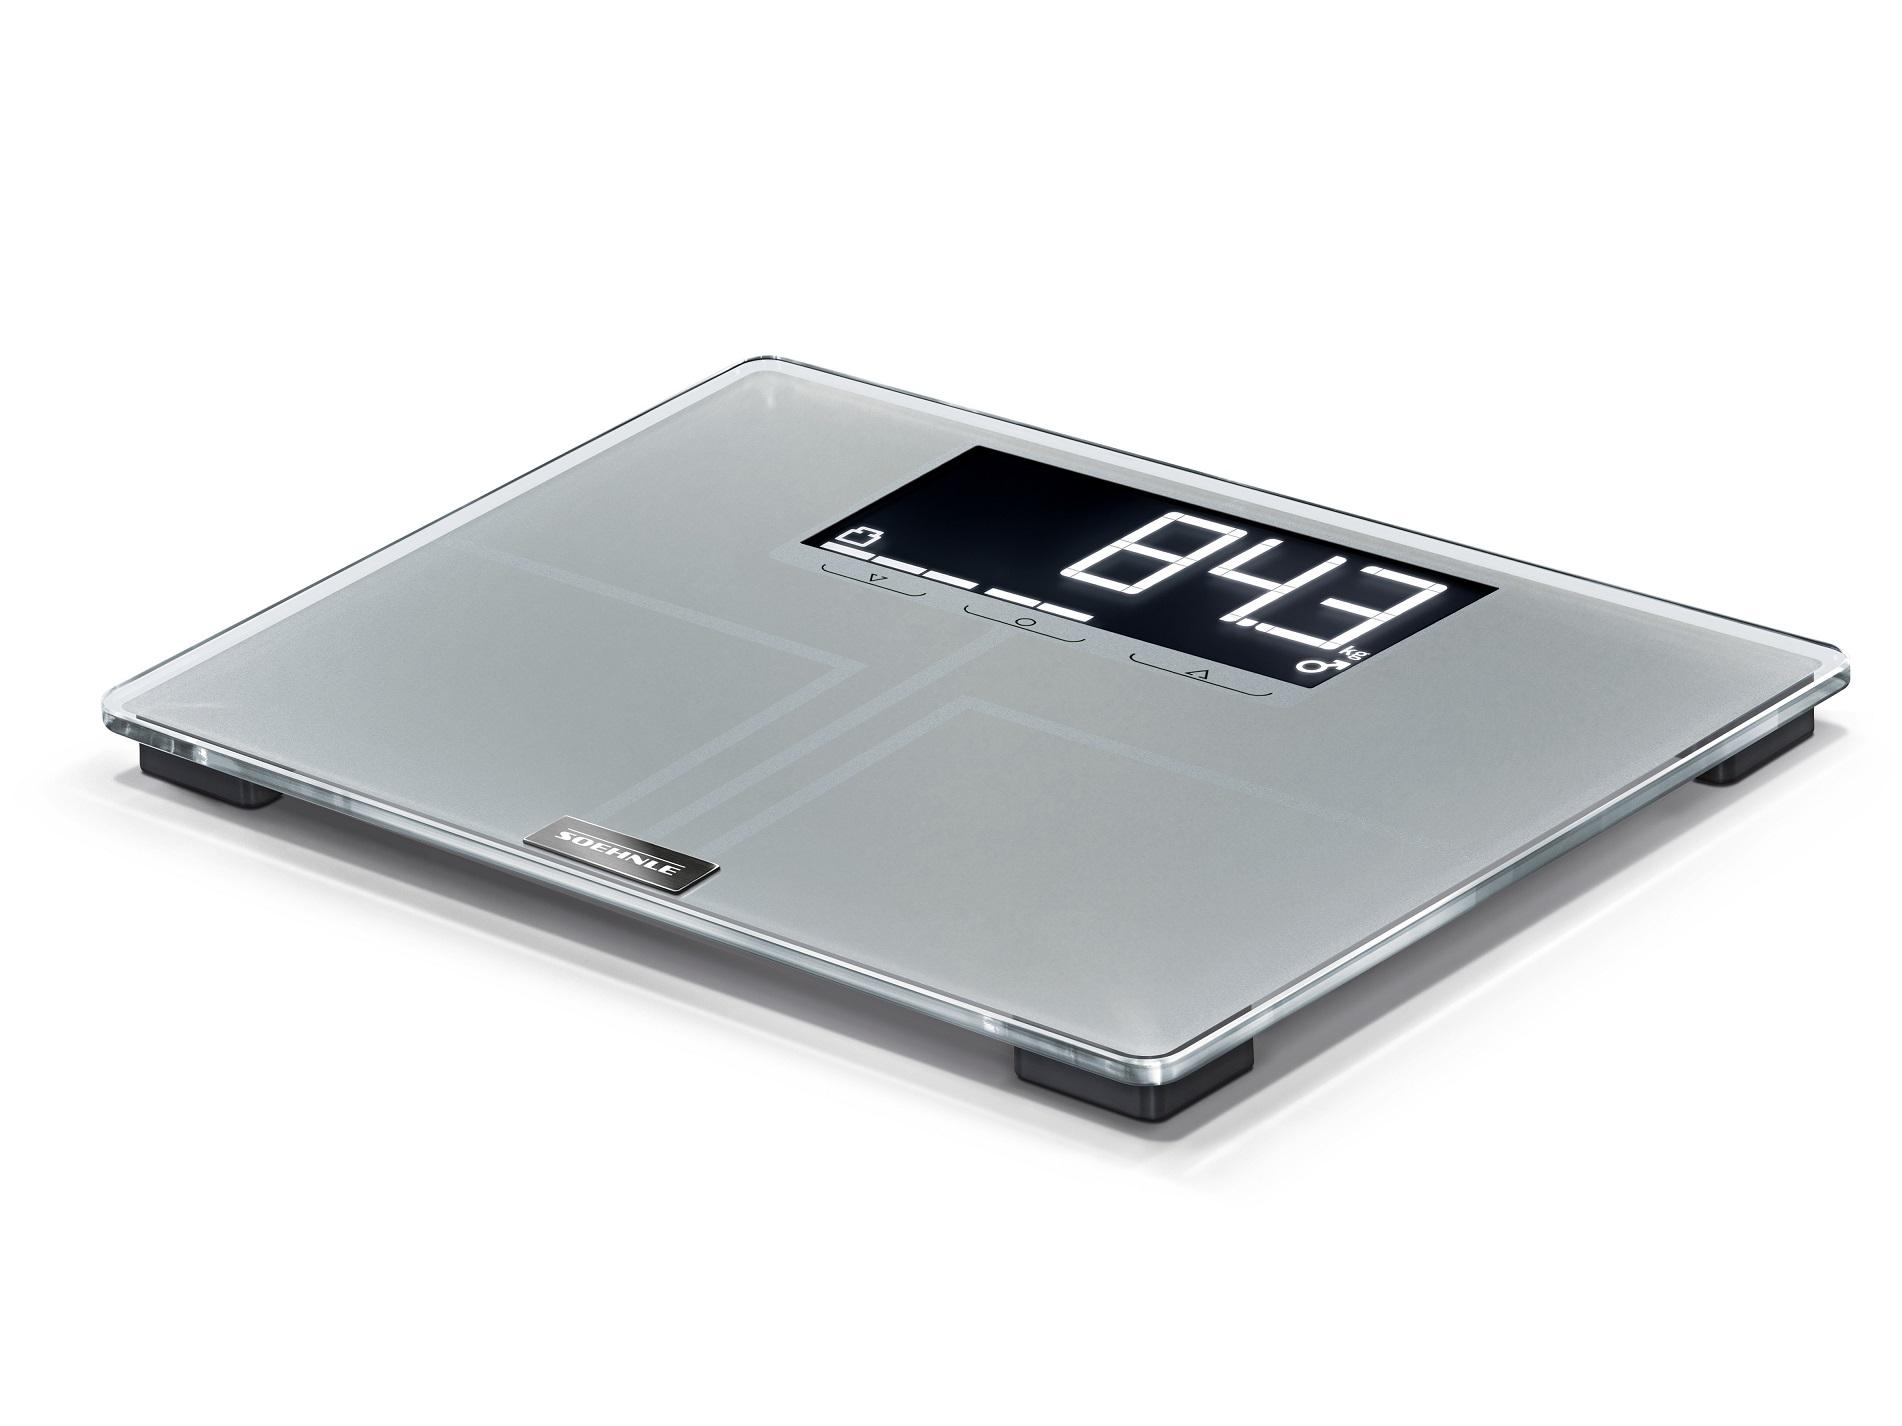 Soehnle Osobní váha SHAPE SENSE Profi 300 - digitální SOEHNLE 63869